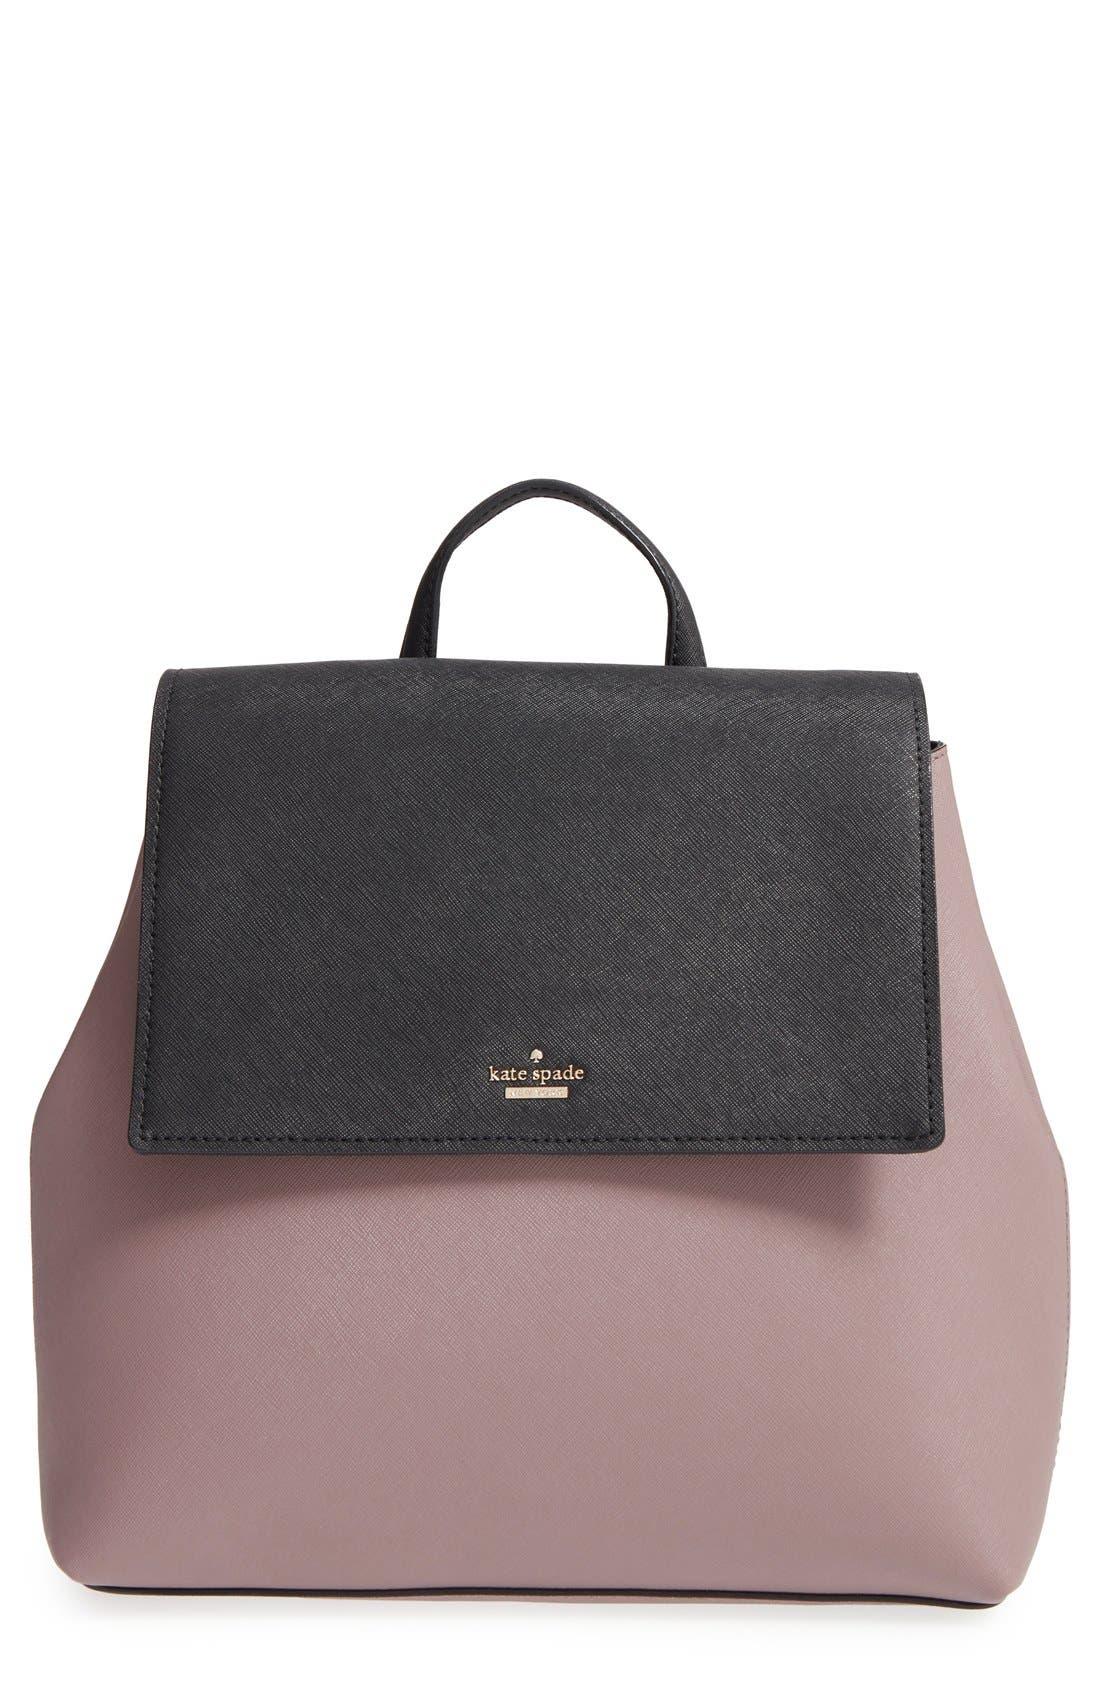 Main Image - kate spade new york 'cameron street - neema' leather backpack